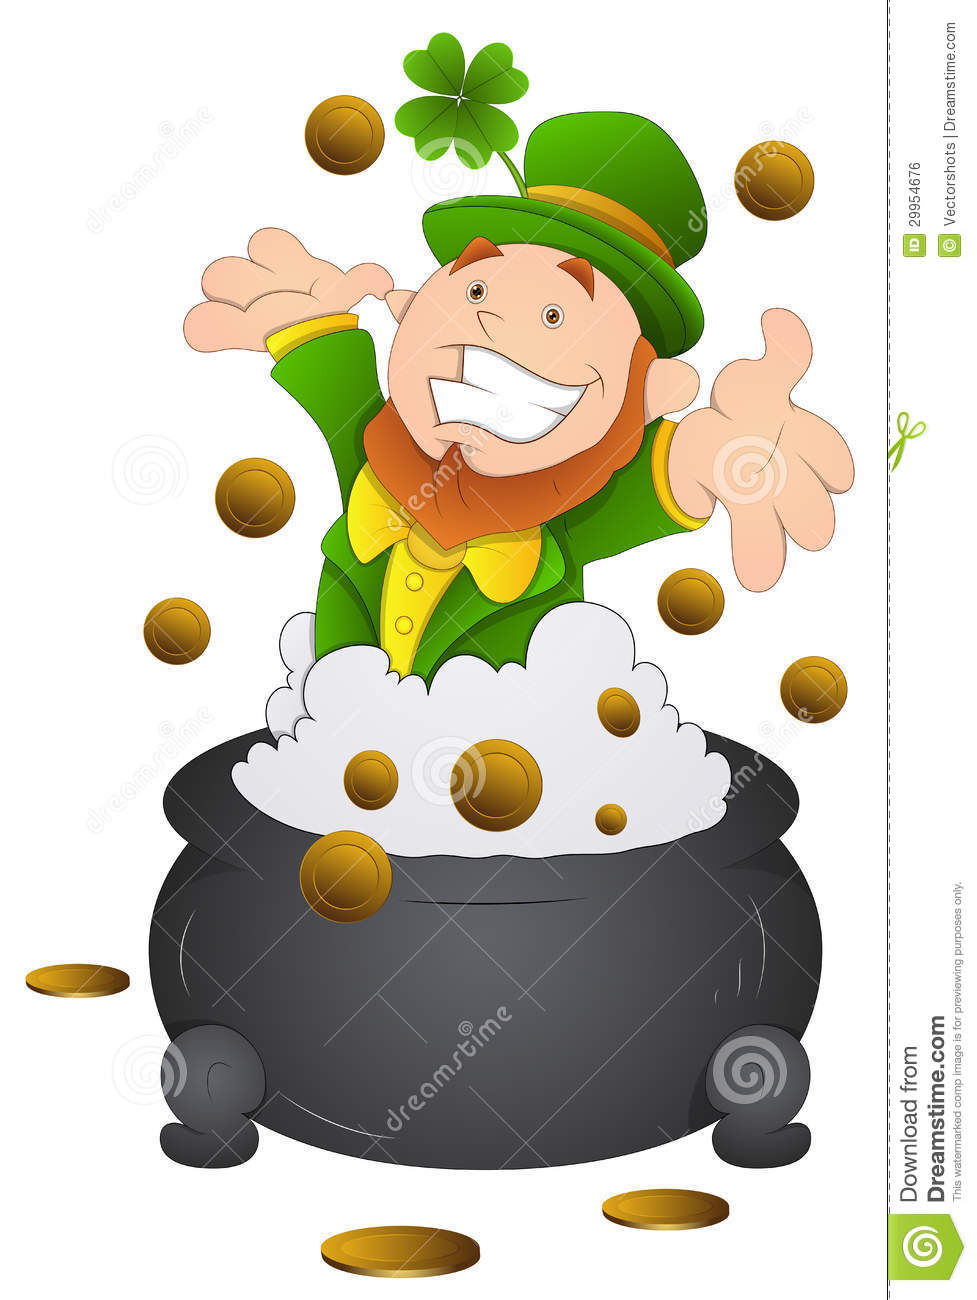 Beautiful Drawing Art Of Happy Cartoon St  Patrick S Day Leprechaun